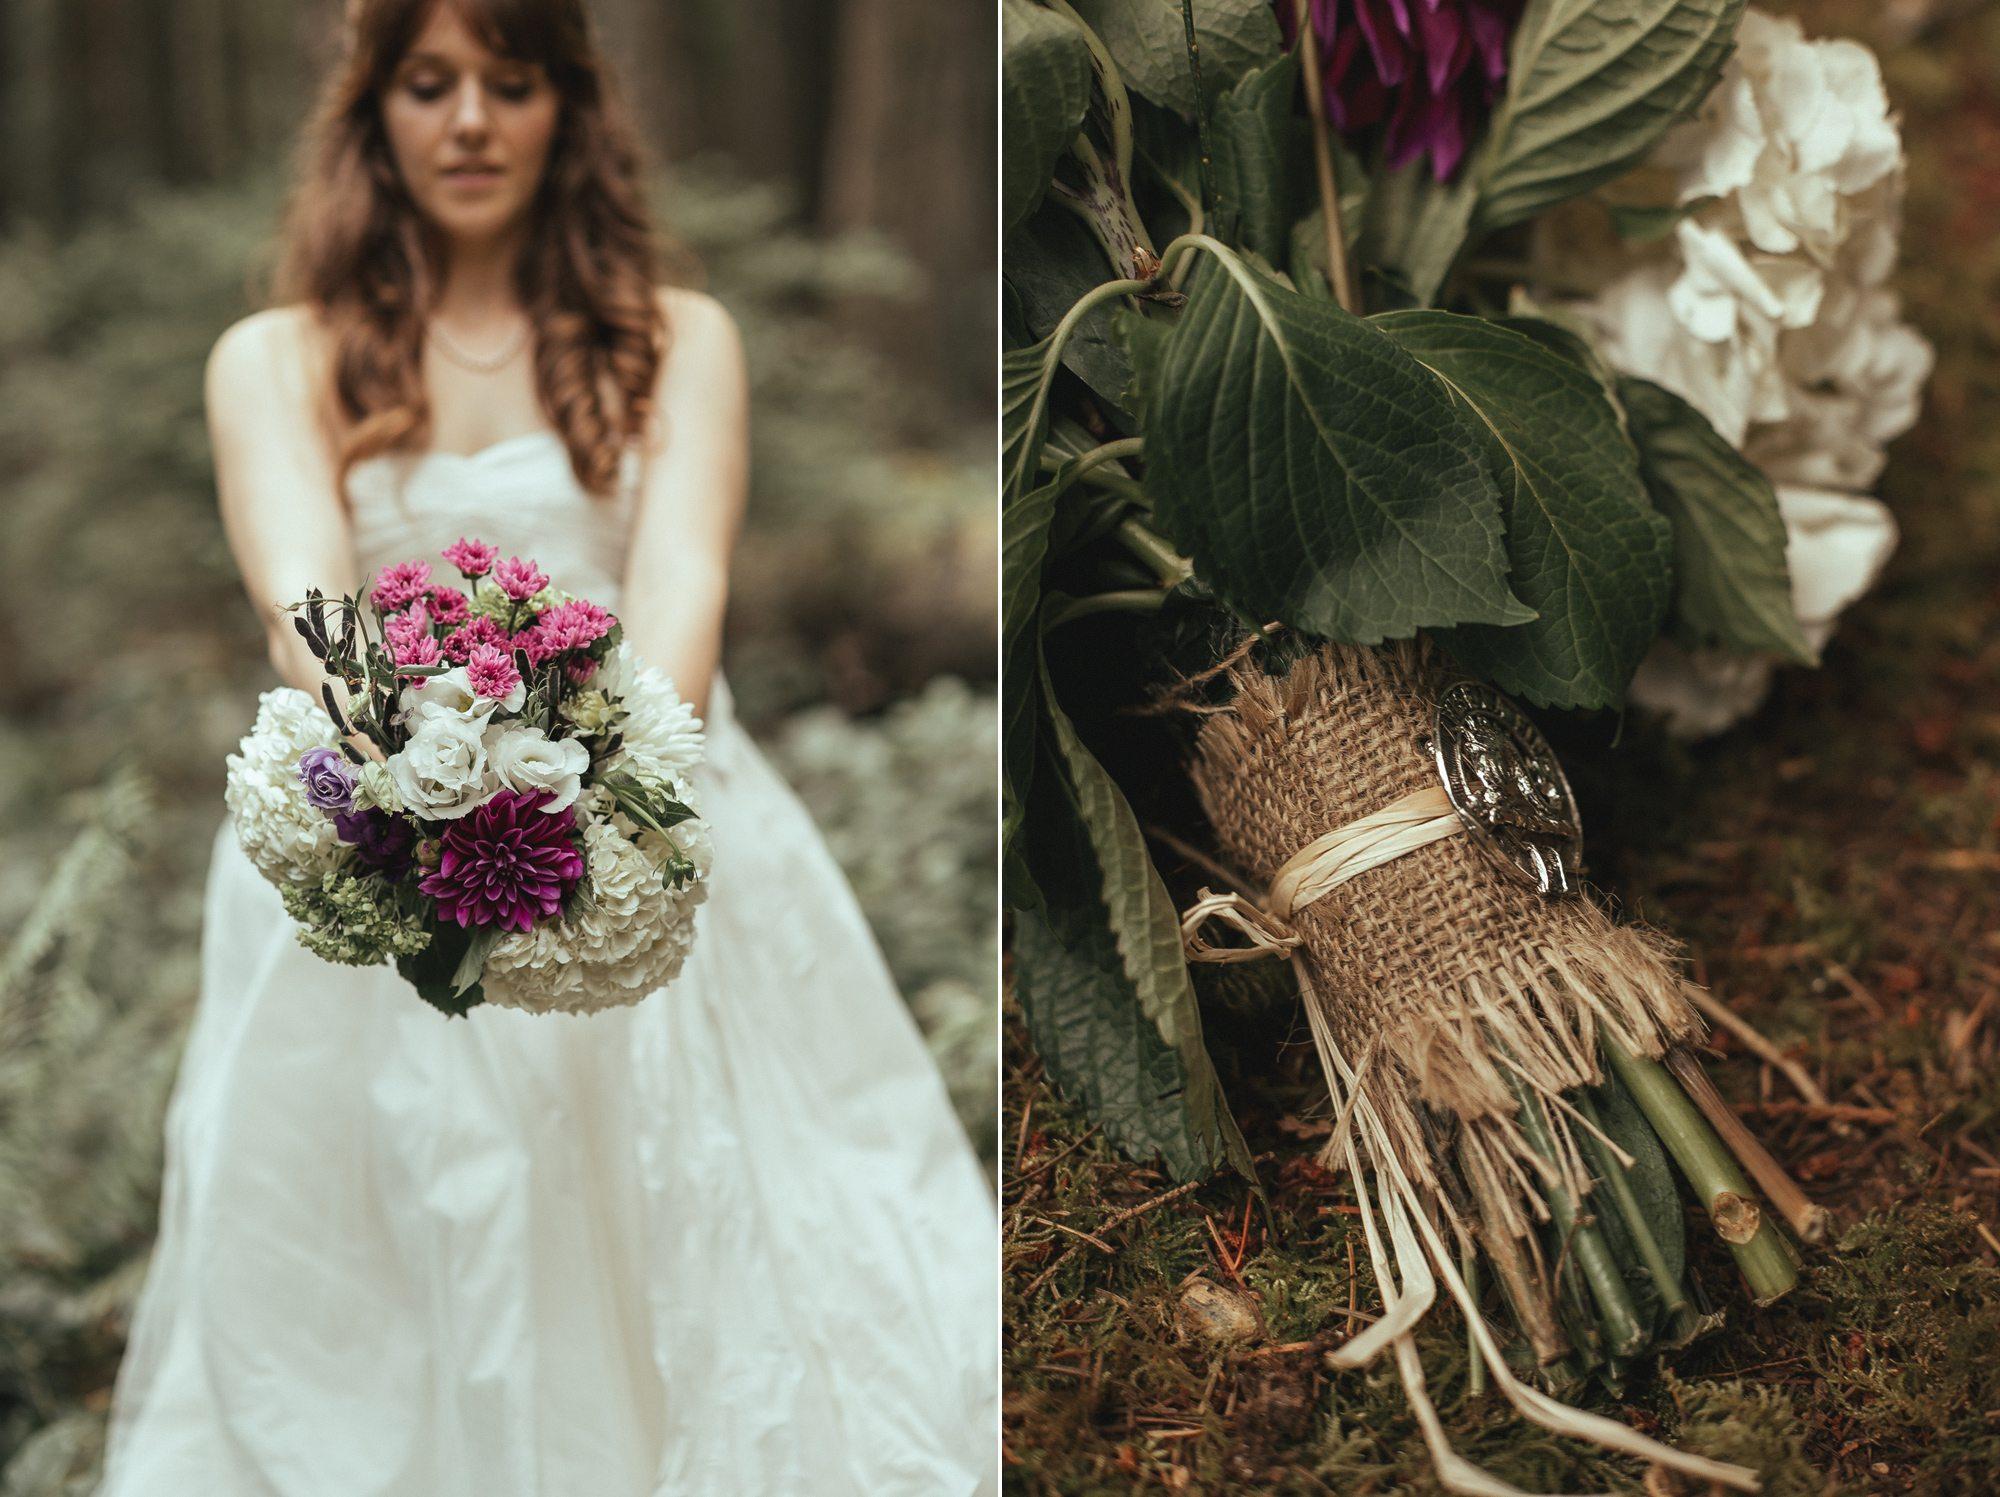 gibsons-wedding-photography-robert-devon43